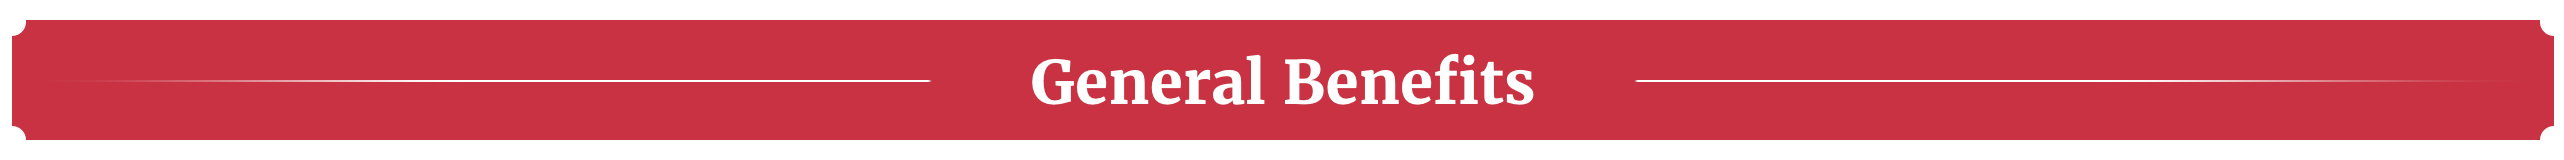 Benefits Indiana Retired Teachers Association